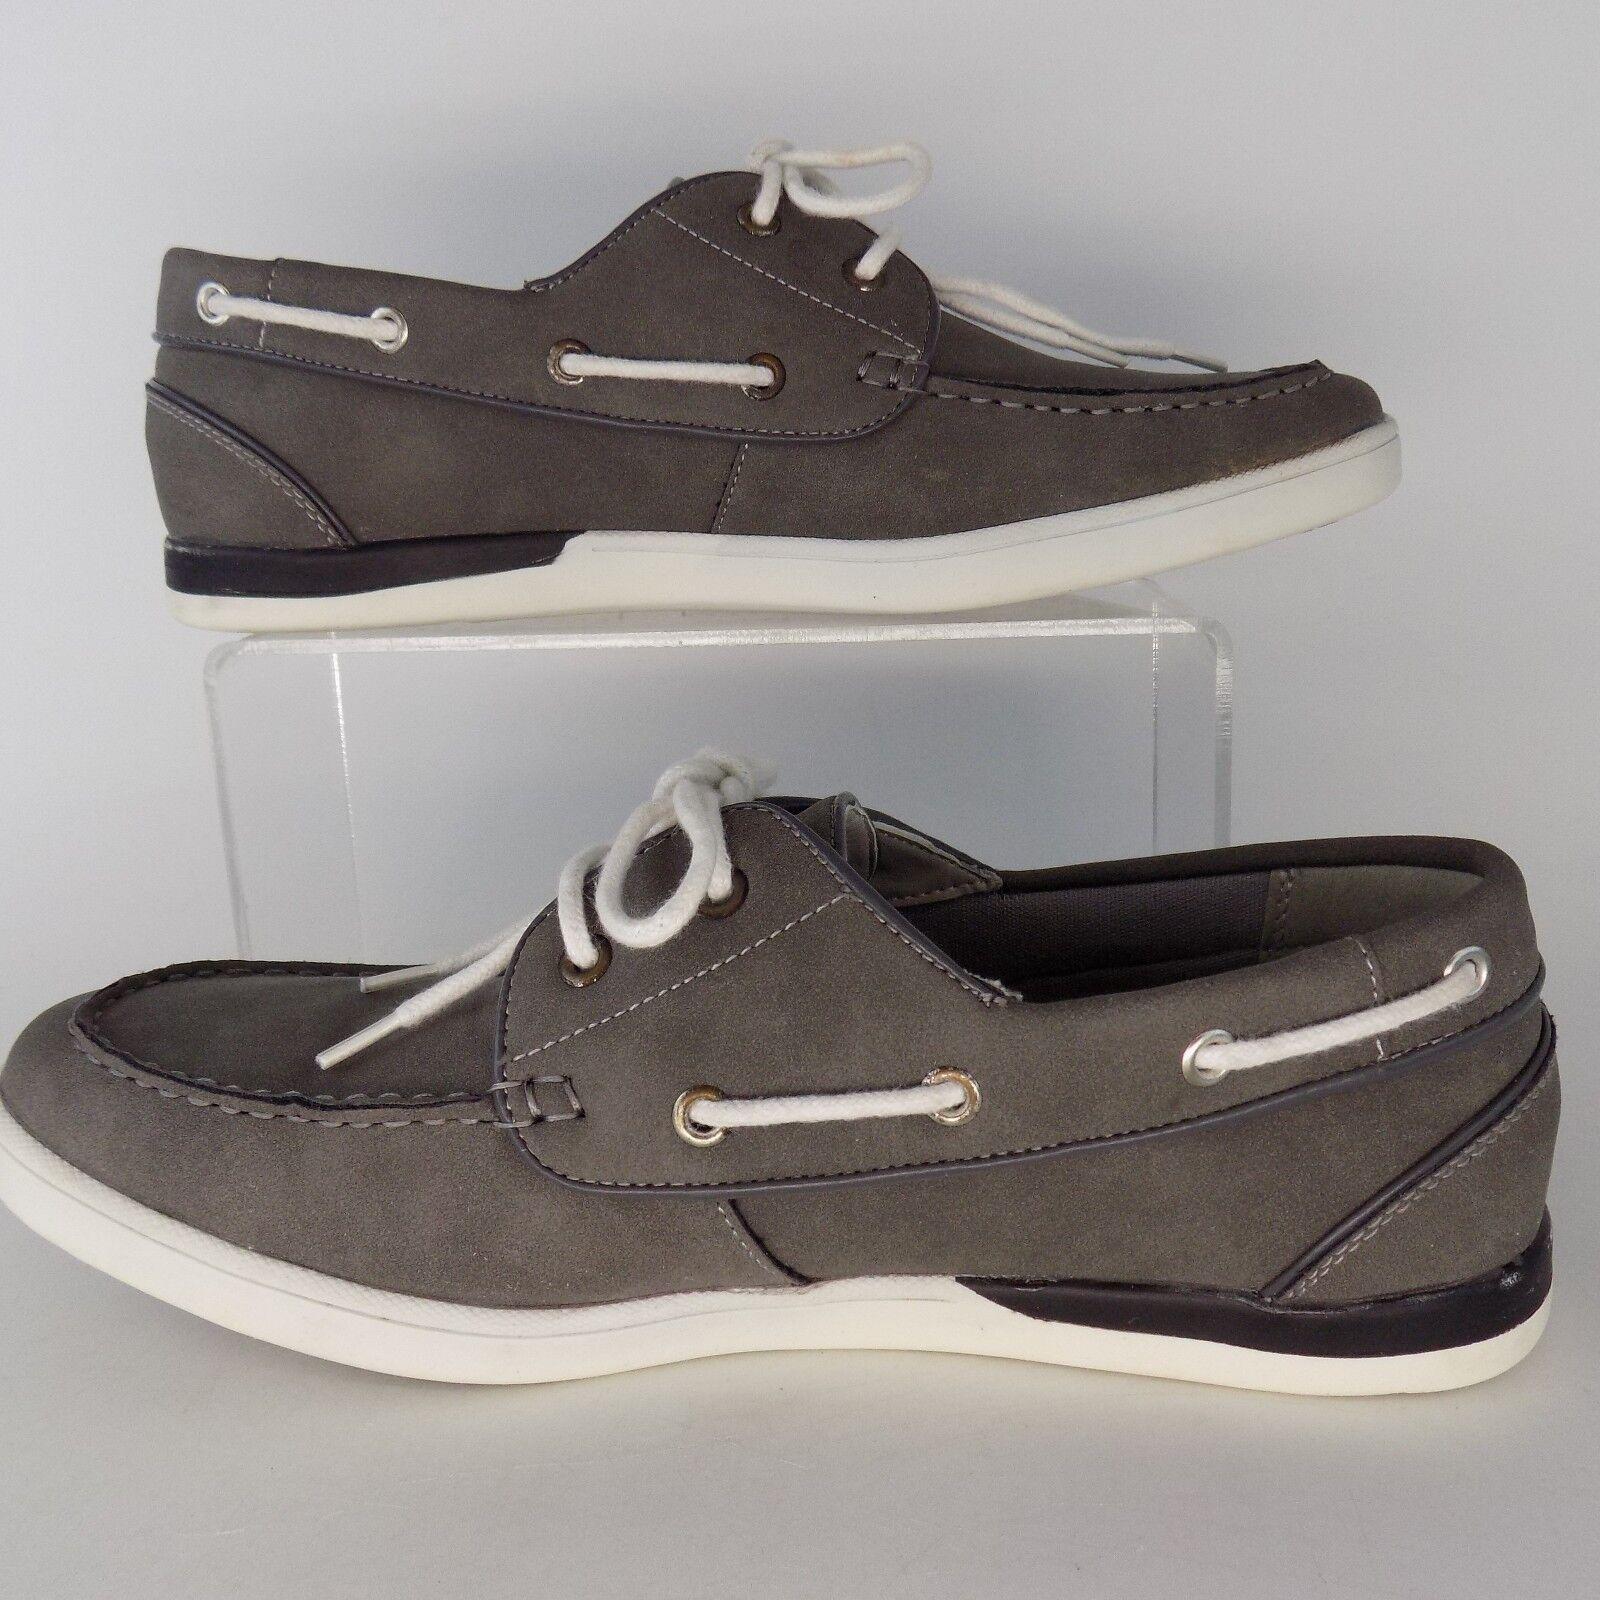 Report bobbiee Fashion Sneakers Mens Casual Shoes Size 10 M AL3075